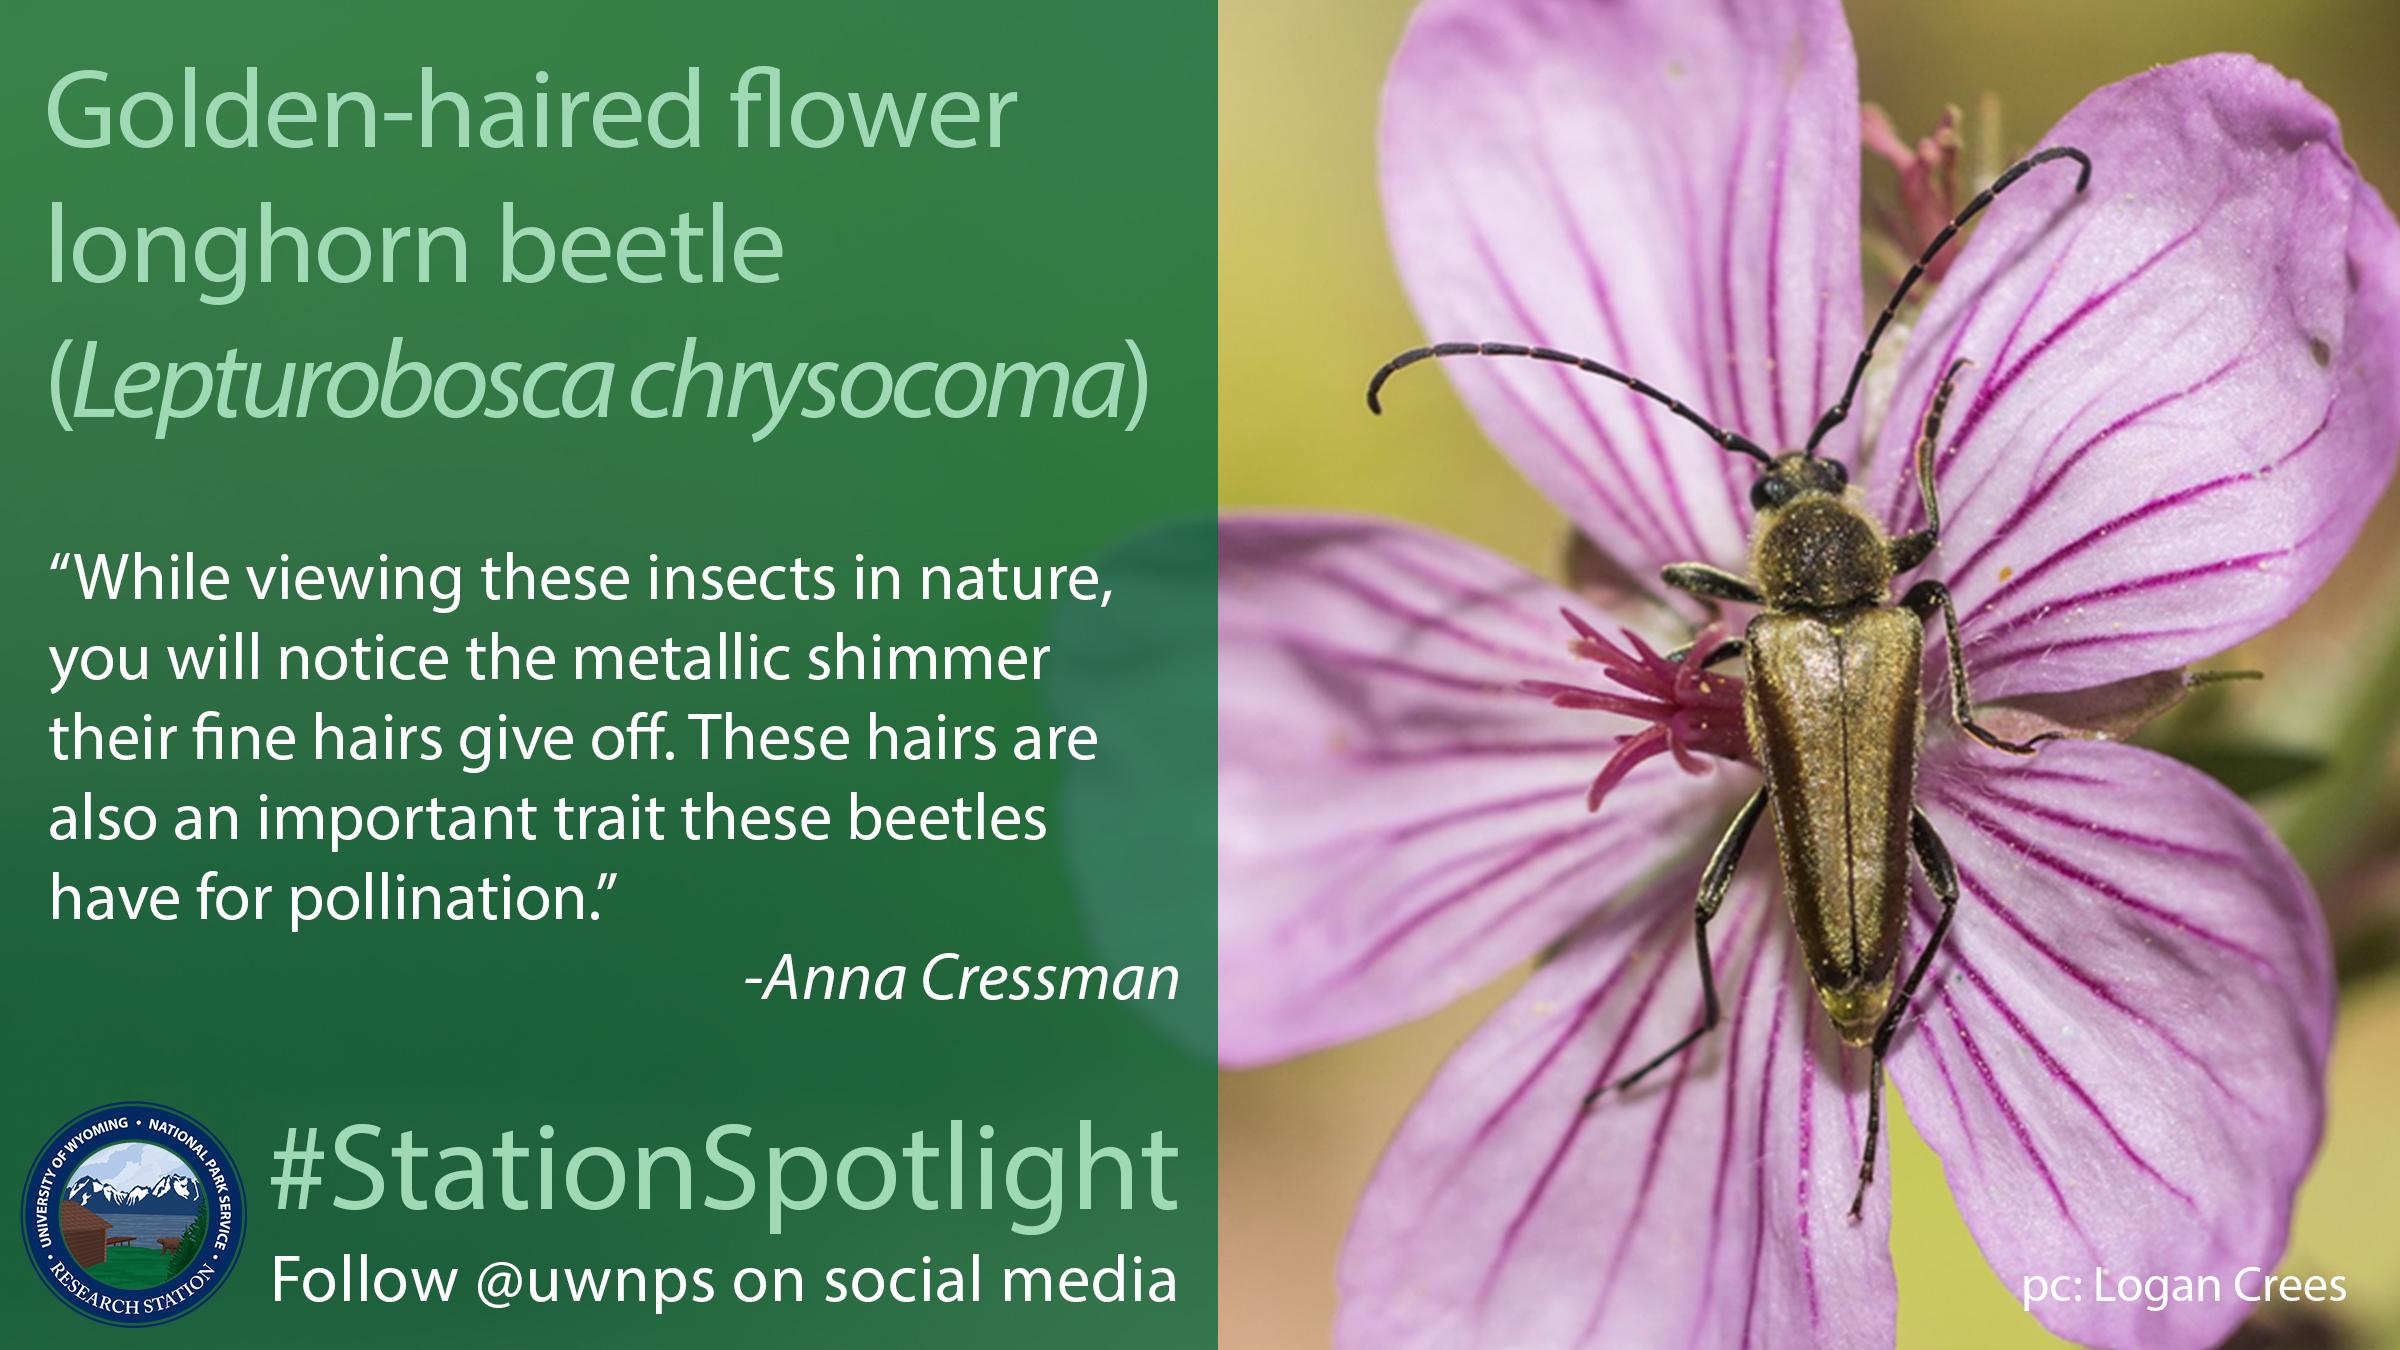 Small golden beetle crawls over a purple flower